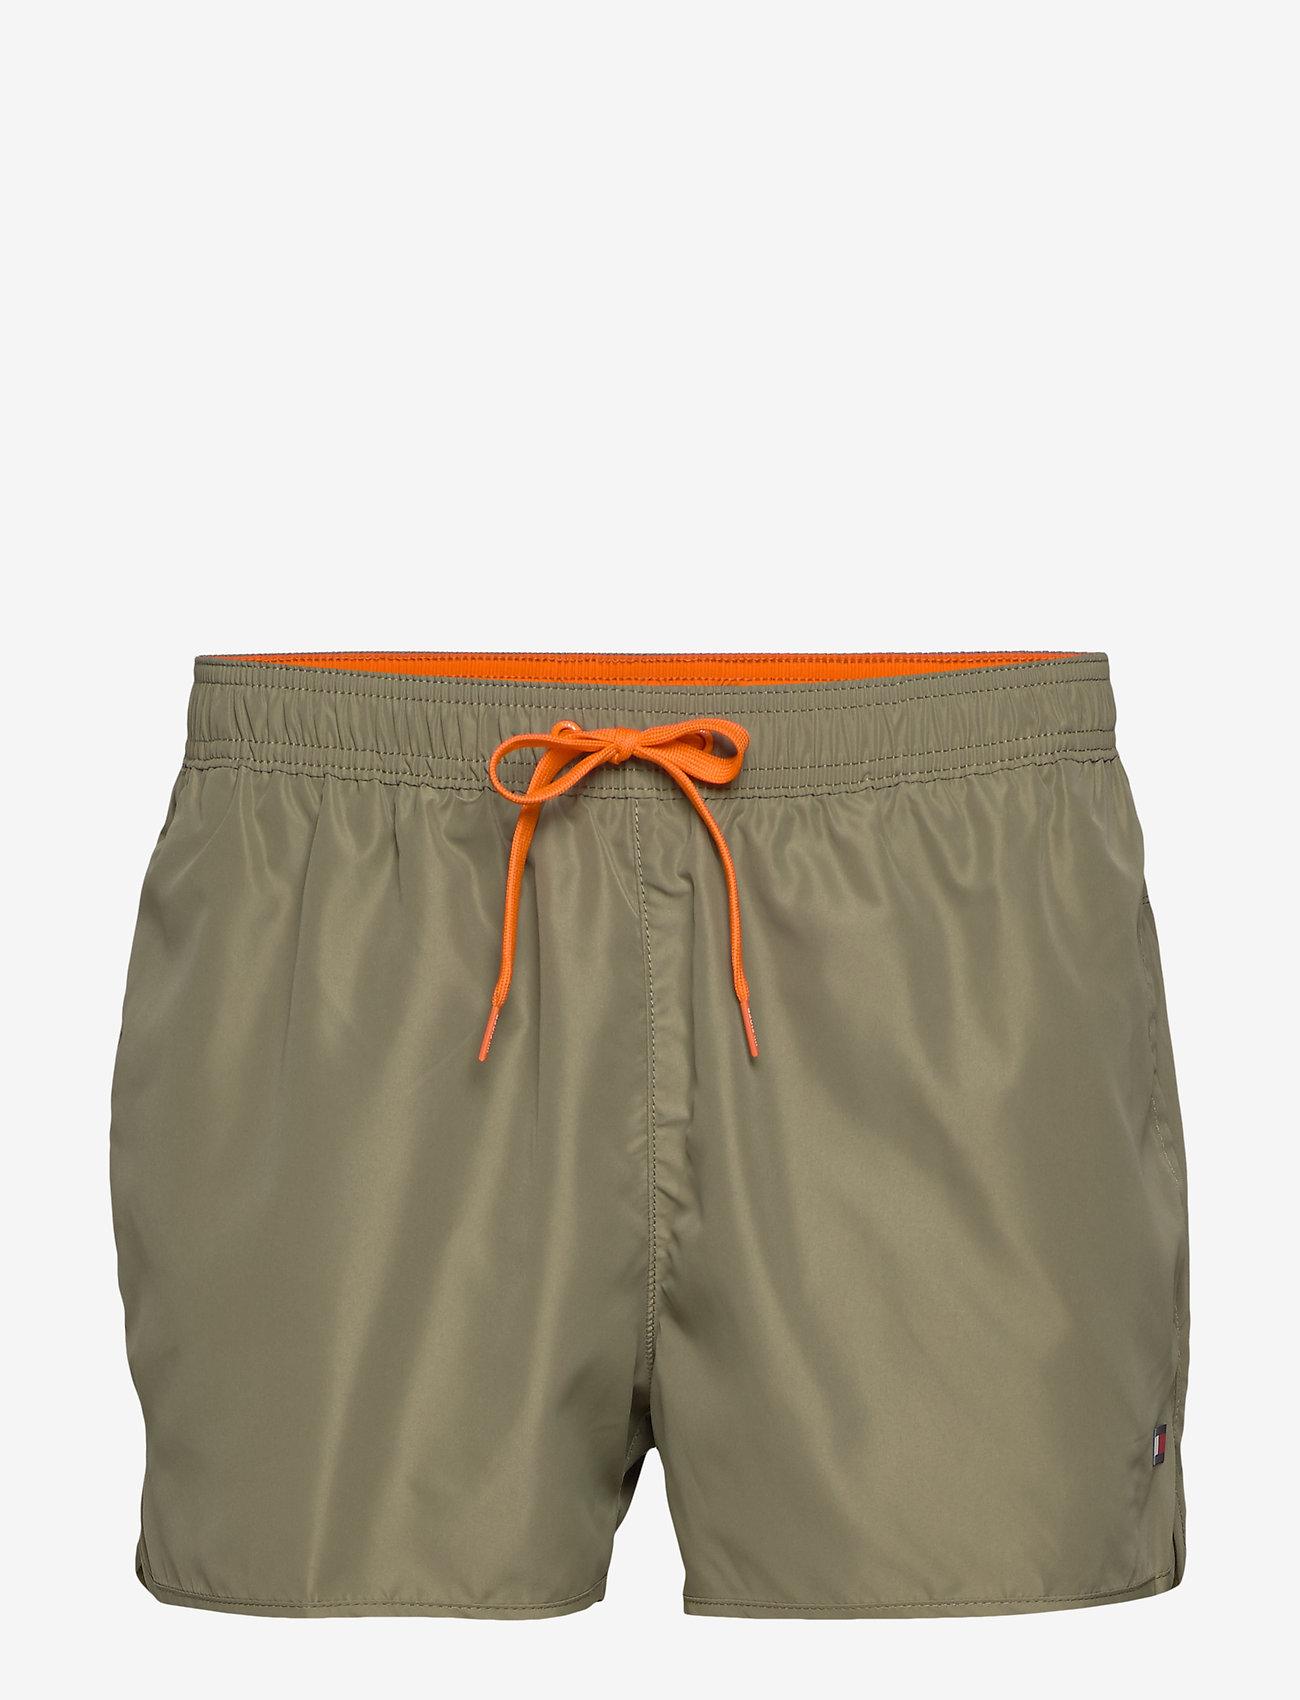 Tommy Hilfiger - RUNNER - shorts de bain - mash green - 0